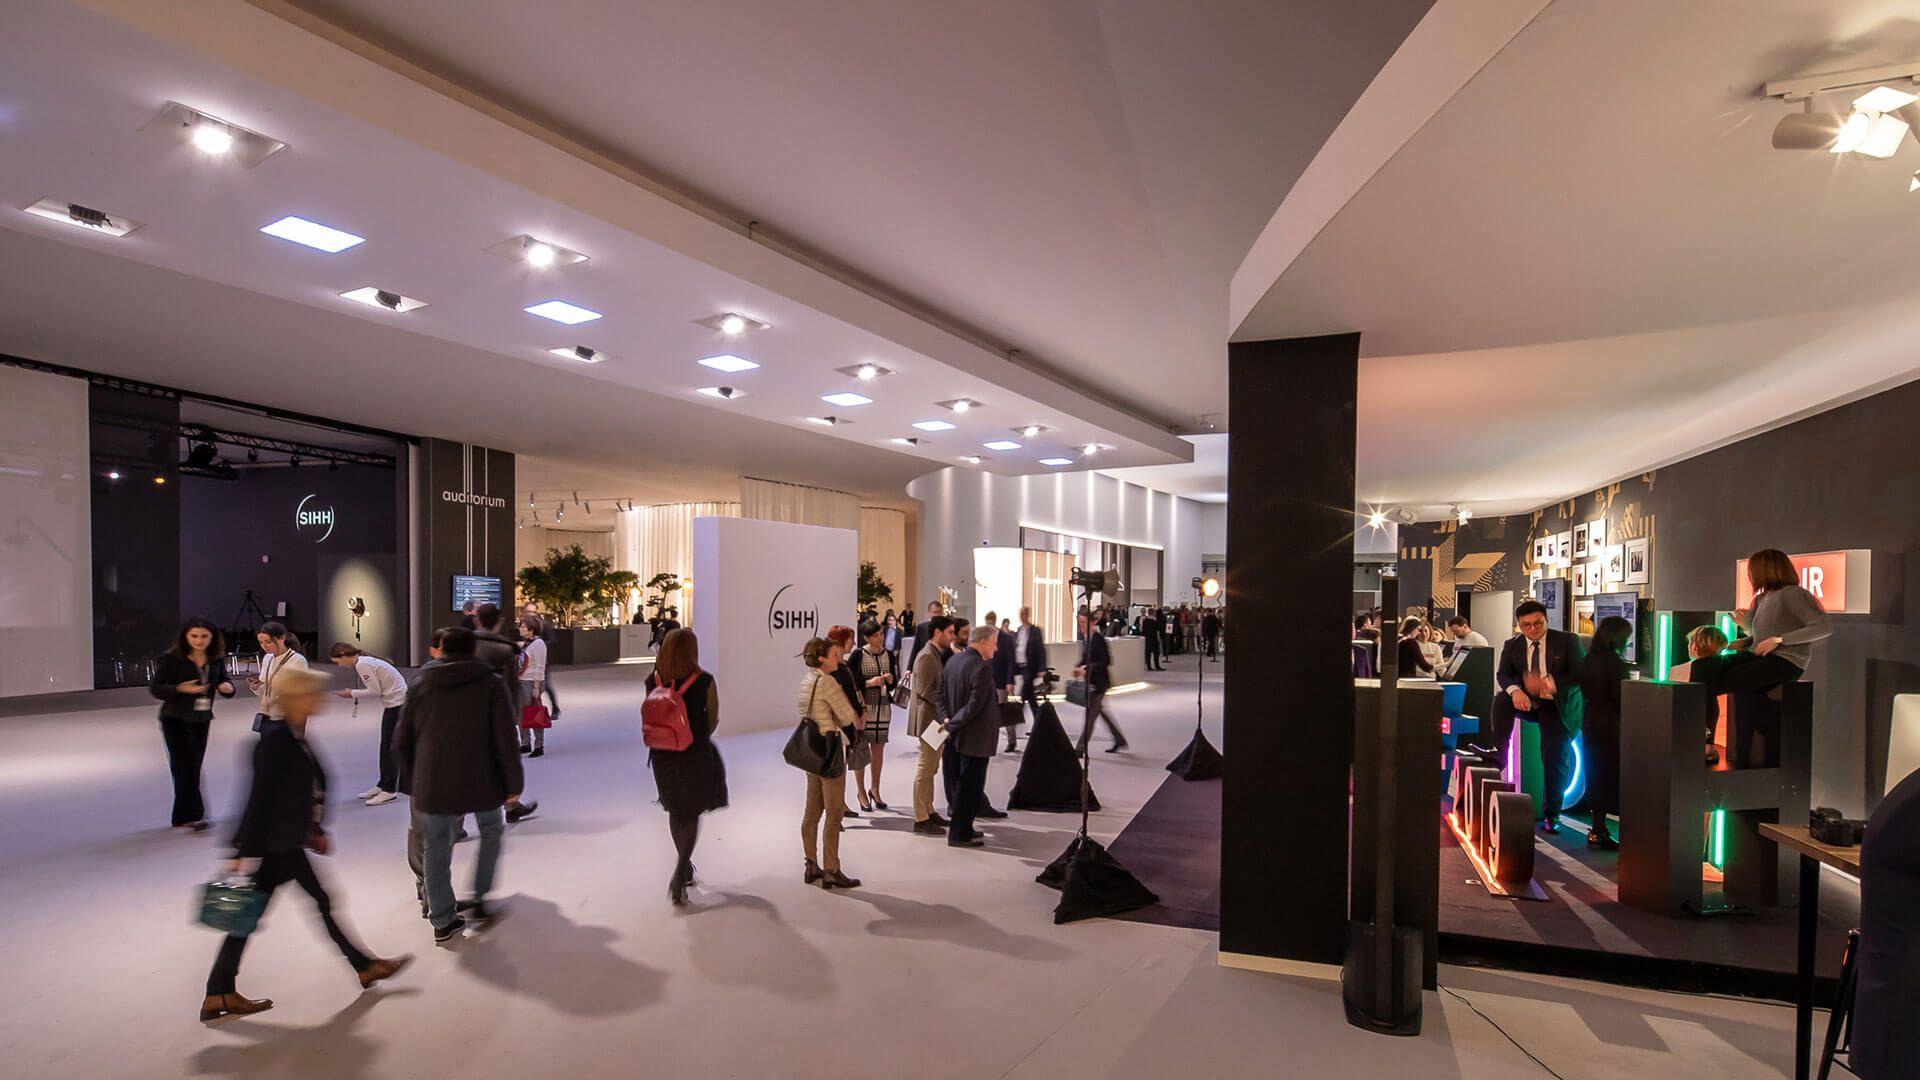 Salon International de la Haute Horlogerie (SIHH) Will Rebrand As Watches & Wonders Geneva In 2020